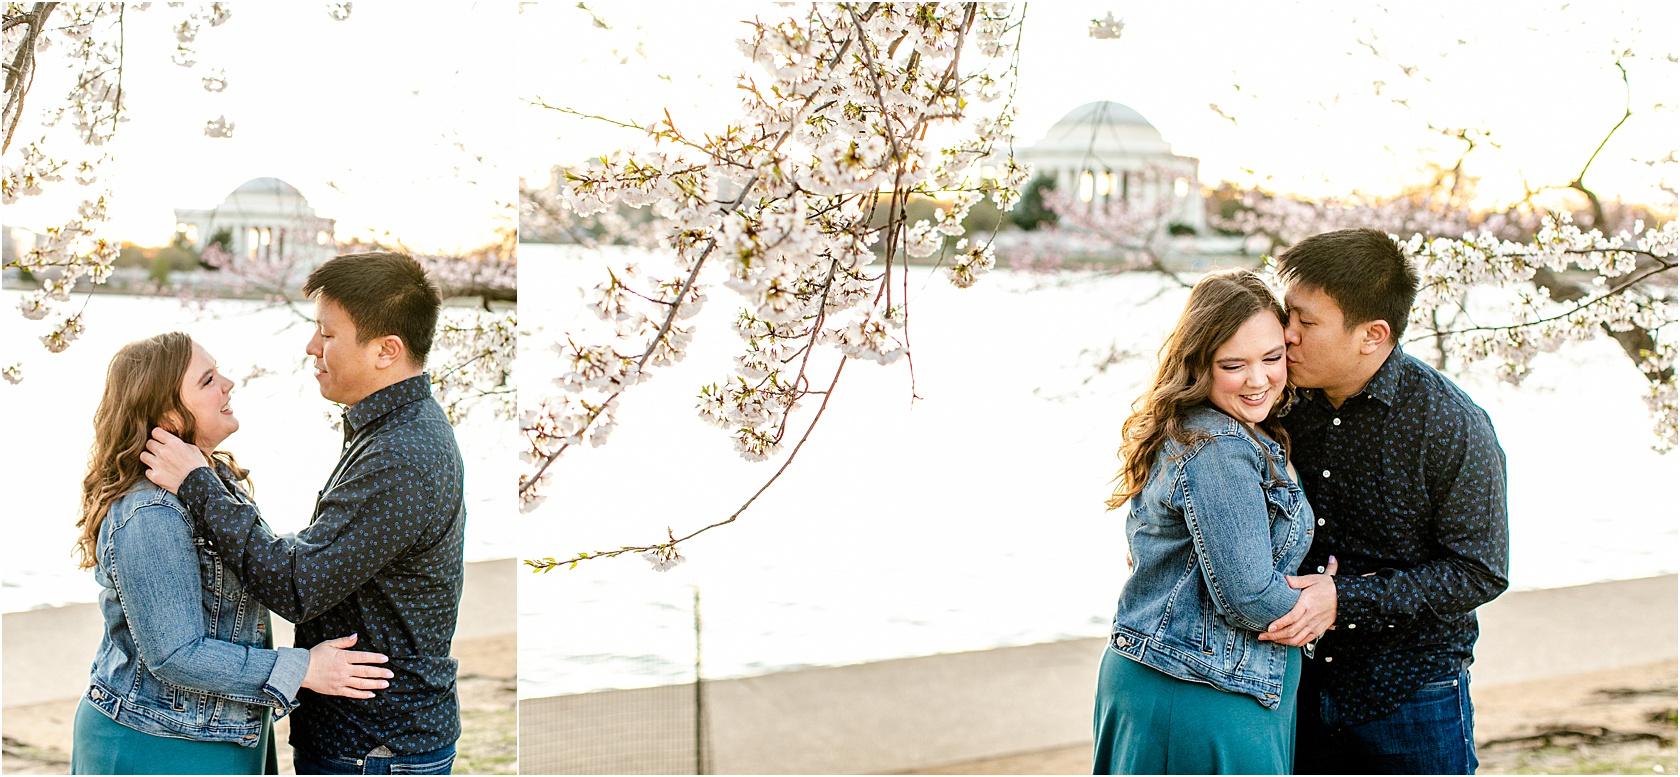 MelissaKevinCherryBlossomsDCEngagementSessionMarch2019LivingRadiantPhotographyphotos_0002.jpg